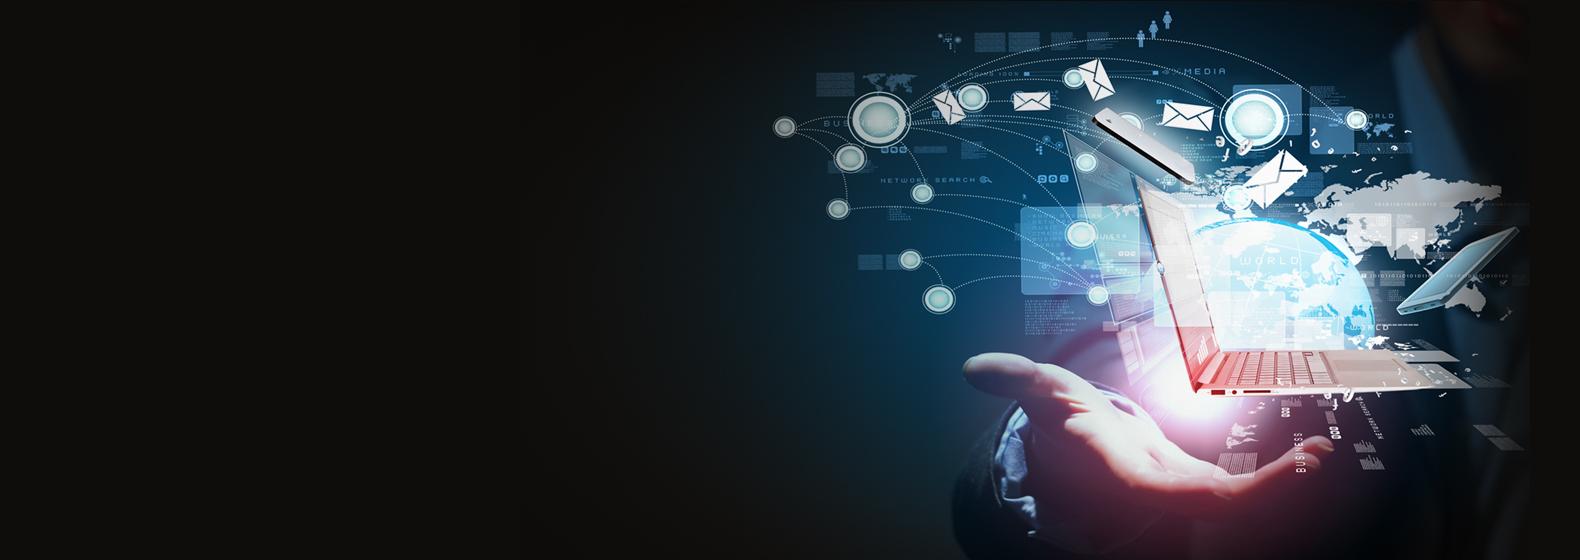 Online Marketing Services California